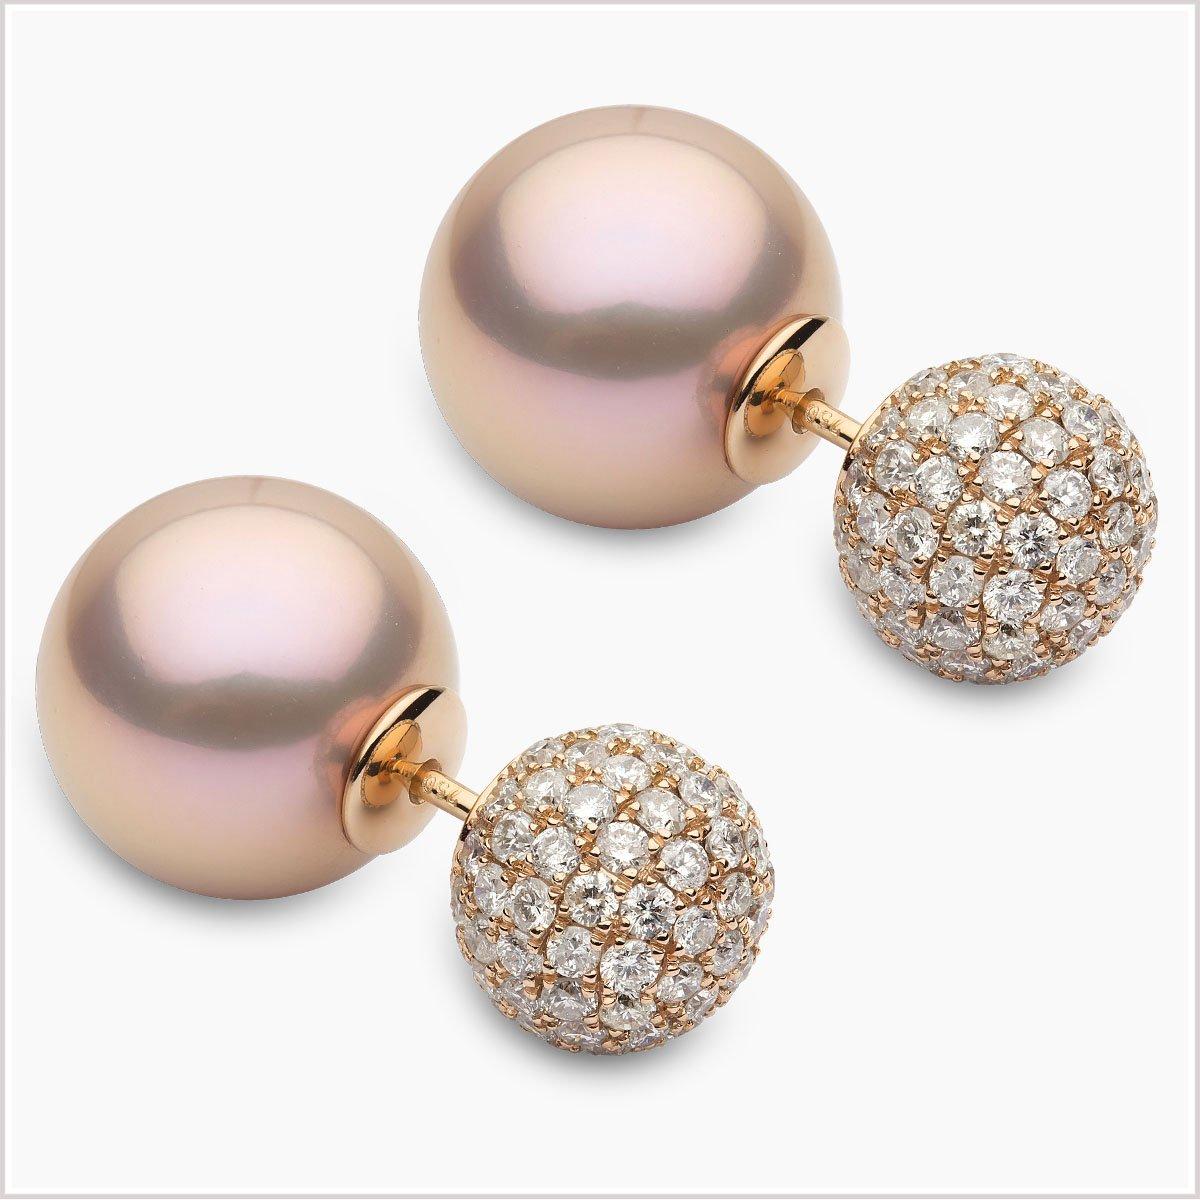 Yoko London Novus Duet Freshwater Pearl and Diamond Earrings